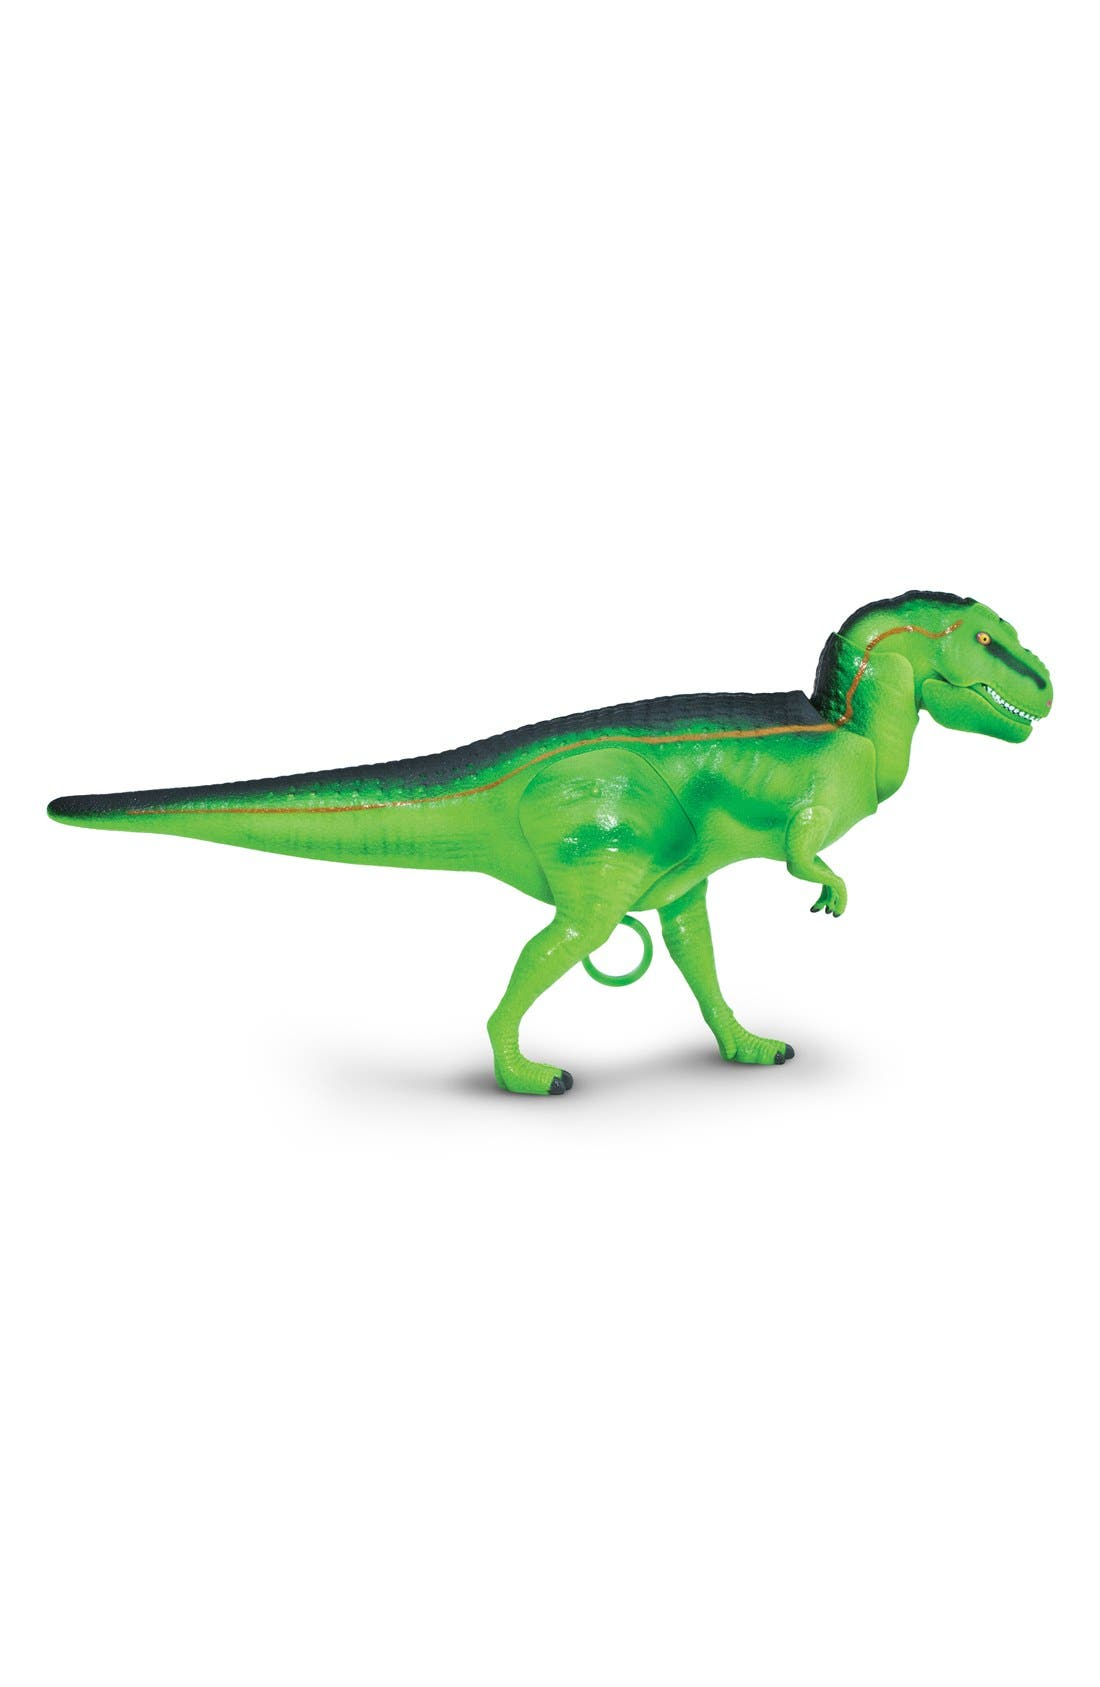 Jaw Snapping Tyrannosaurus Rex Dinosaur Figurine,                             Main thumbnail 1, color,                             No Color